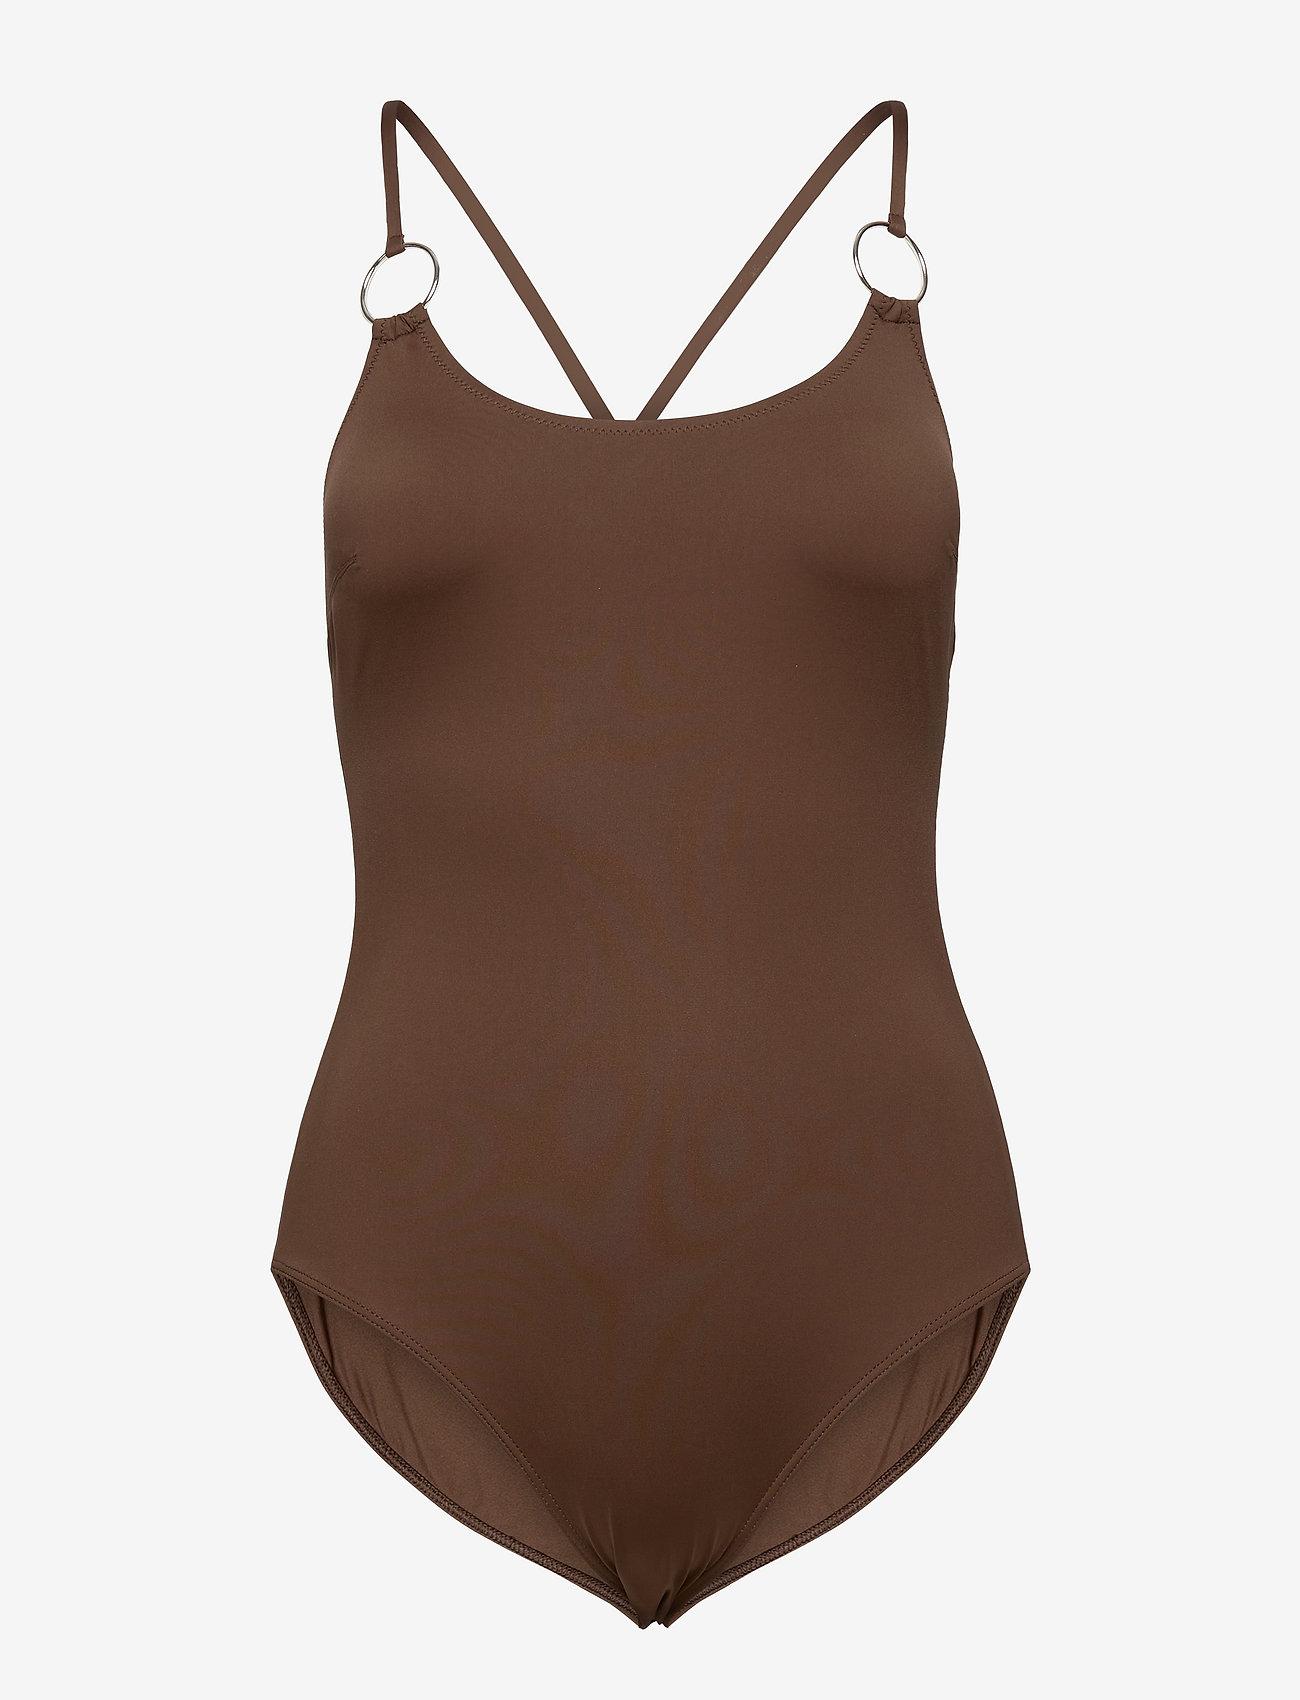 Max Mara Leisure - LAMPADA - swimsuits - brown - 0